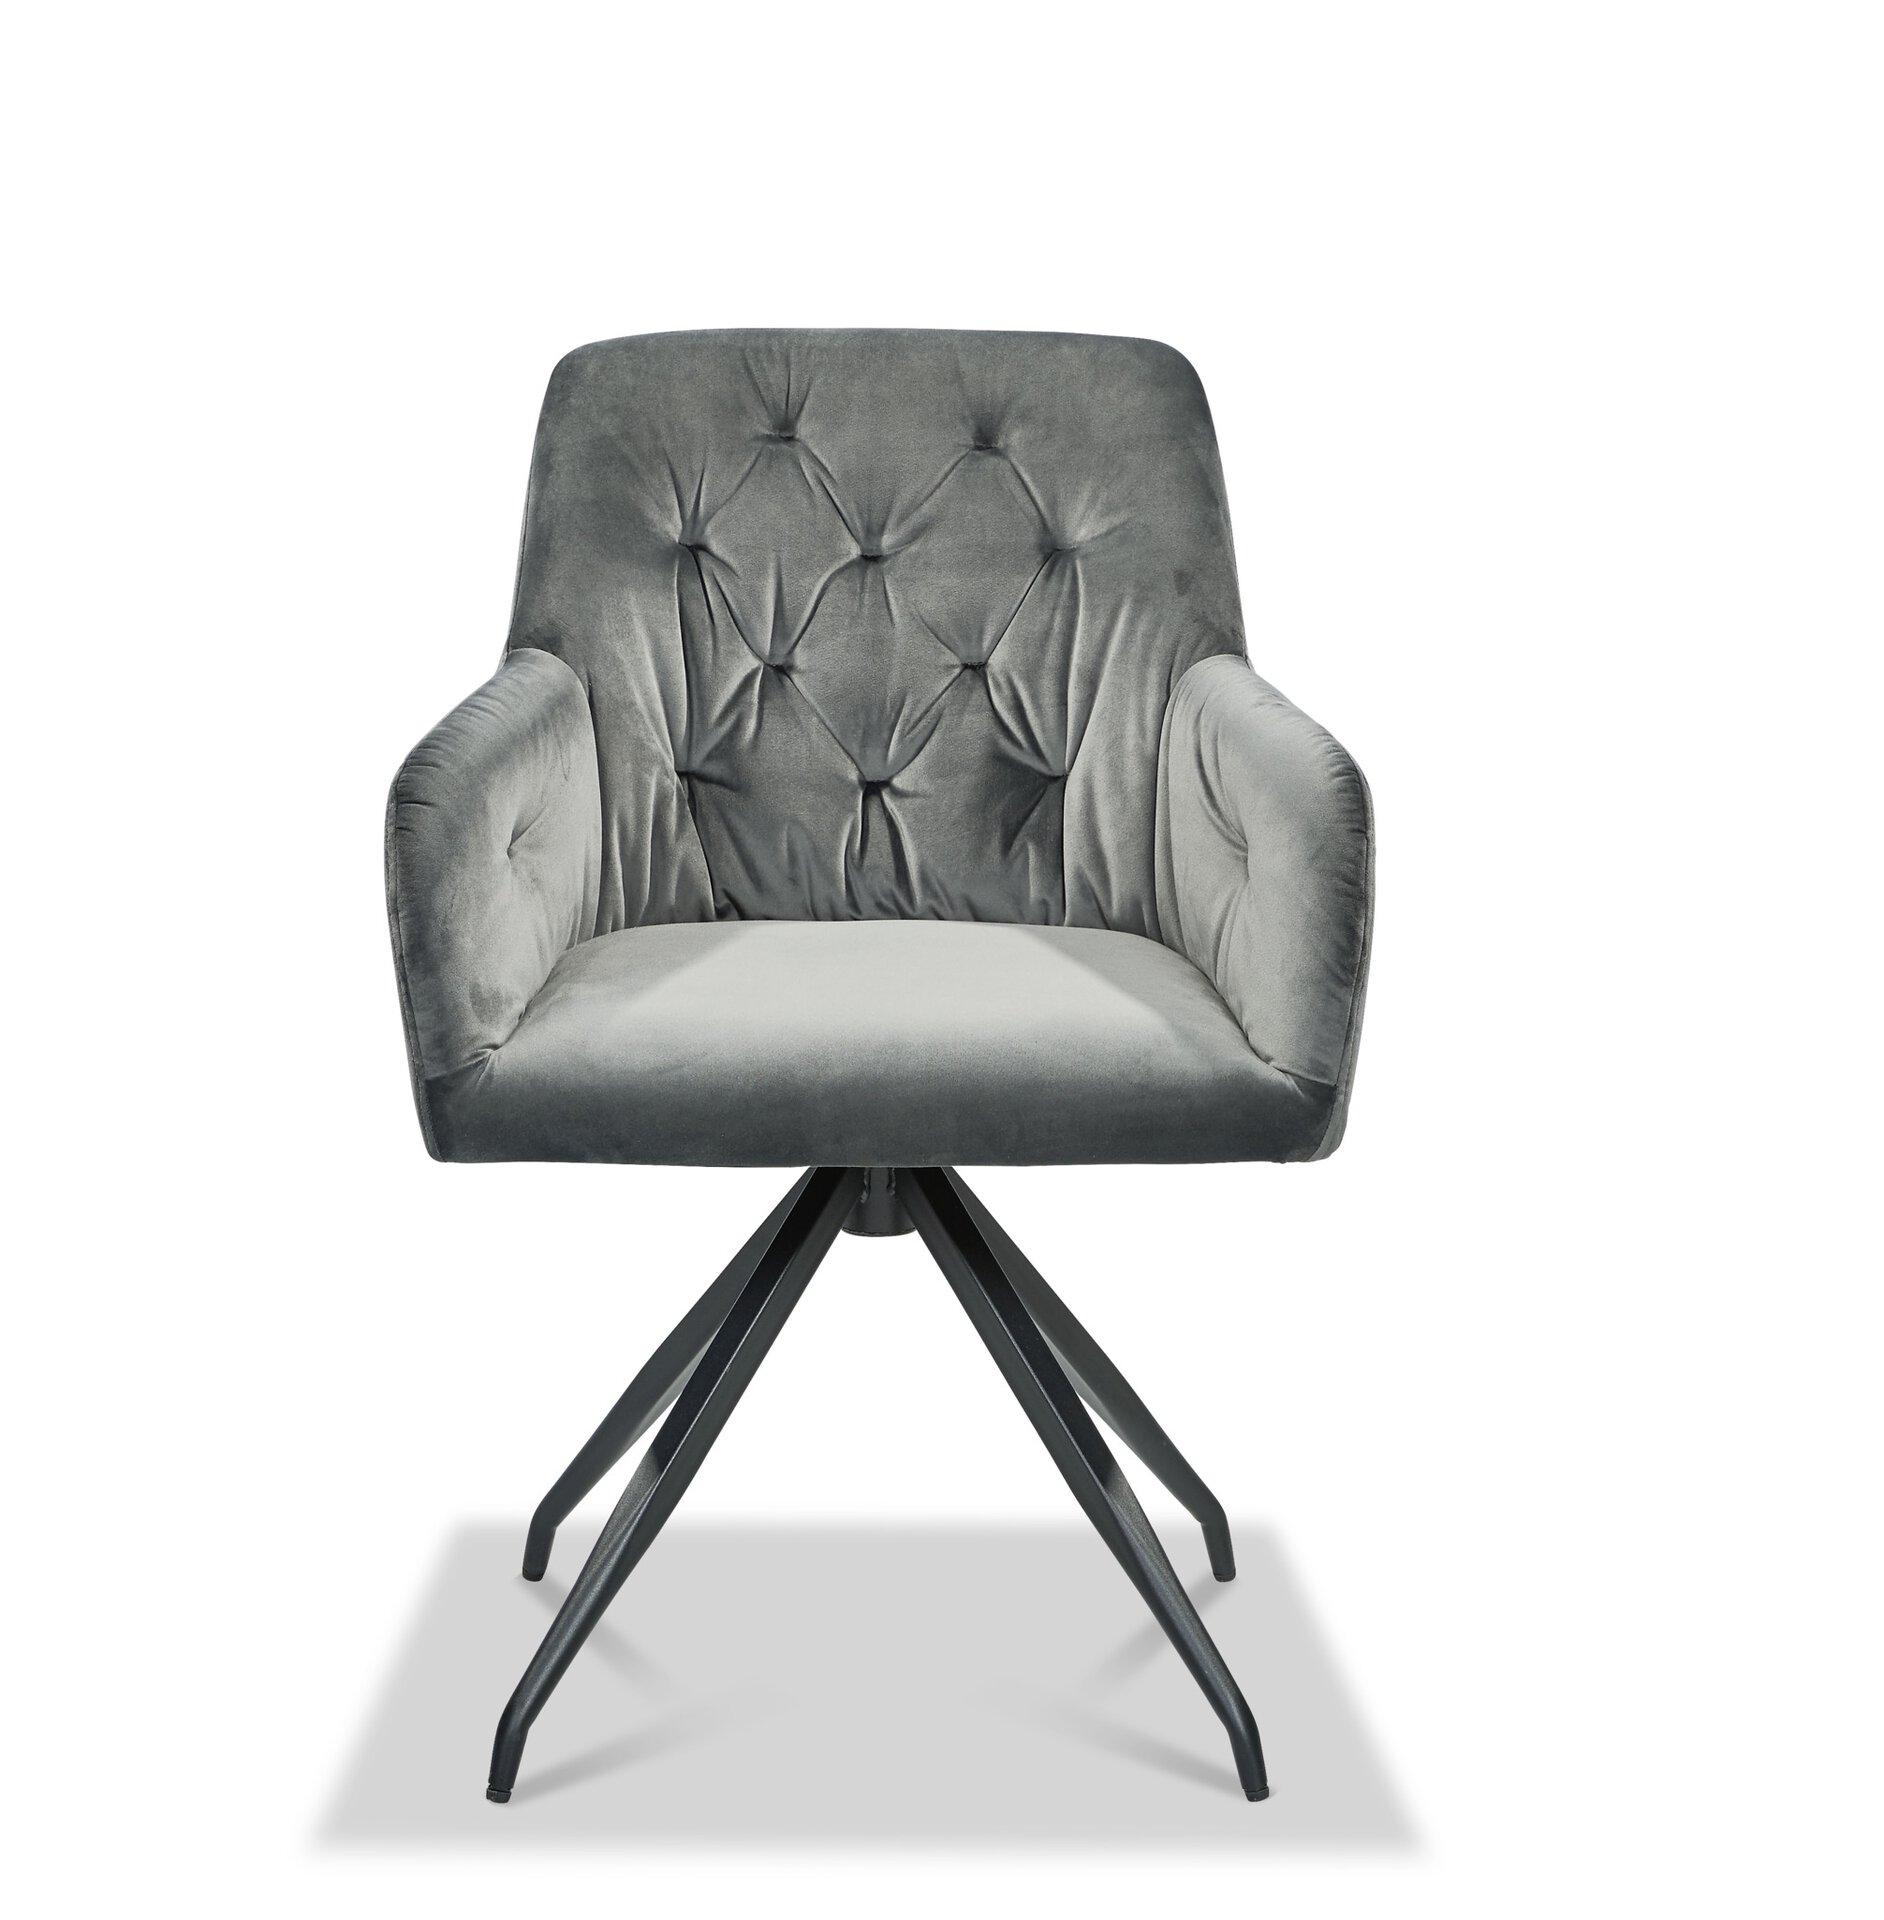 Stuhl SO5463-03 set One by Musterring Textil mehrfarbig 64 x 87 x 62 cm